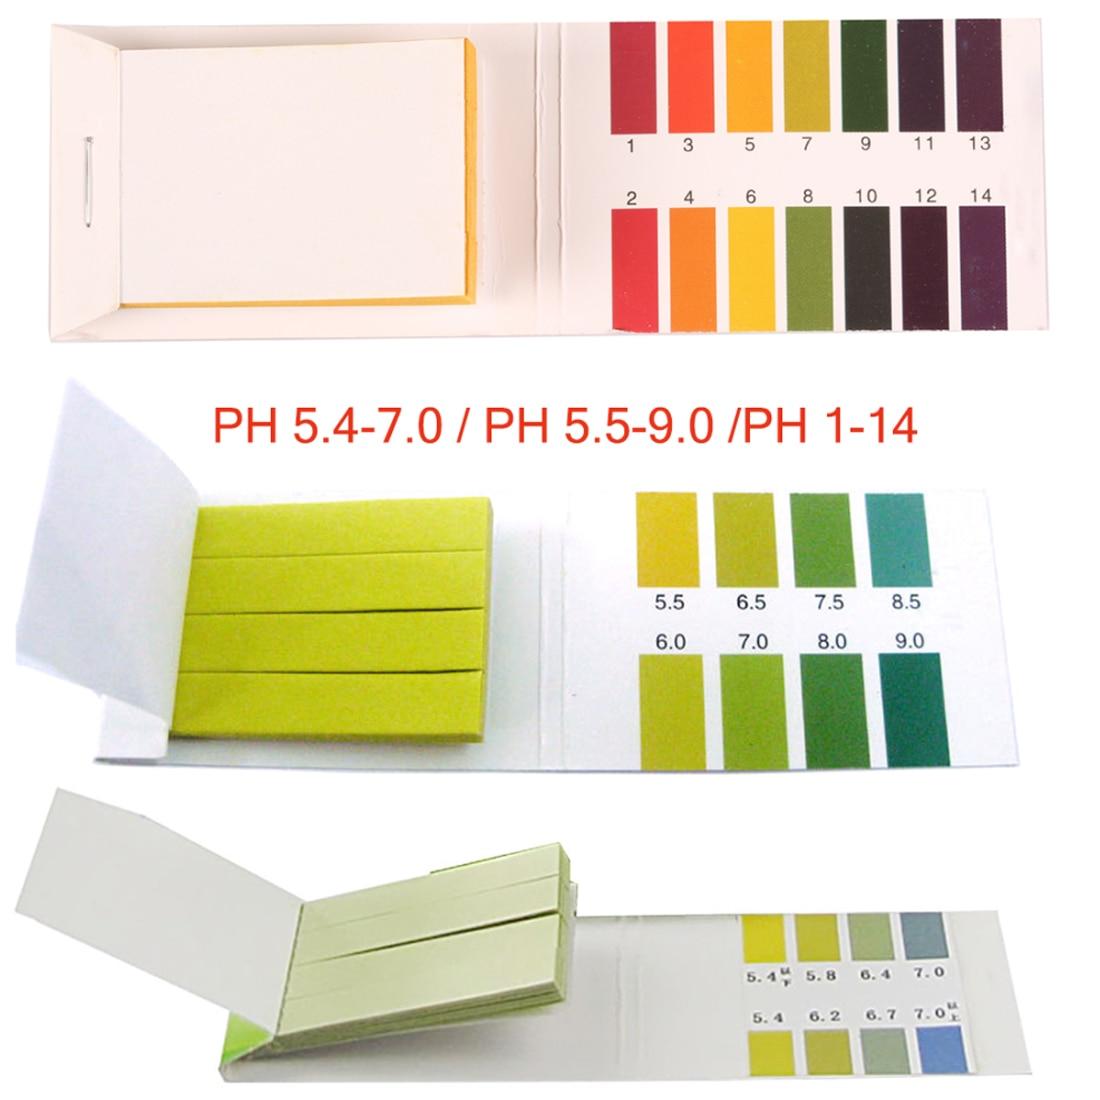 80 Strips PH 5.4-7.0,PH 5.5-9.0,PH 1 -14  Alkaline Test Papers Strips Indicator Lab Supplies Litmus Testing Kit For Plant,Water